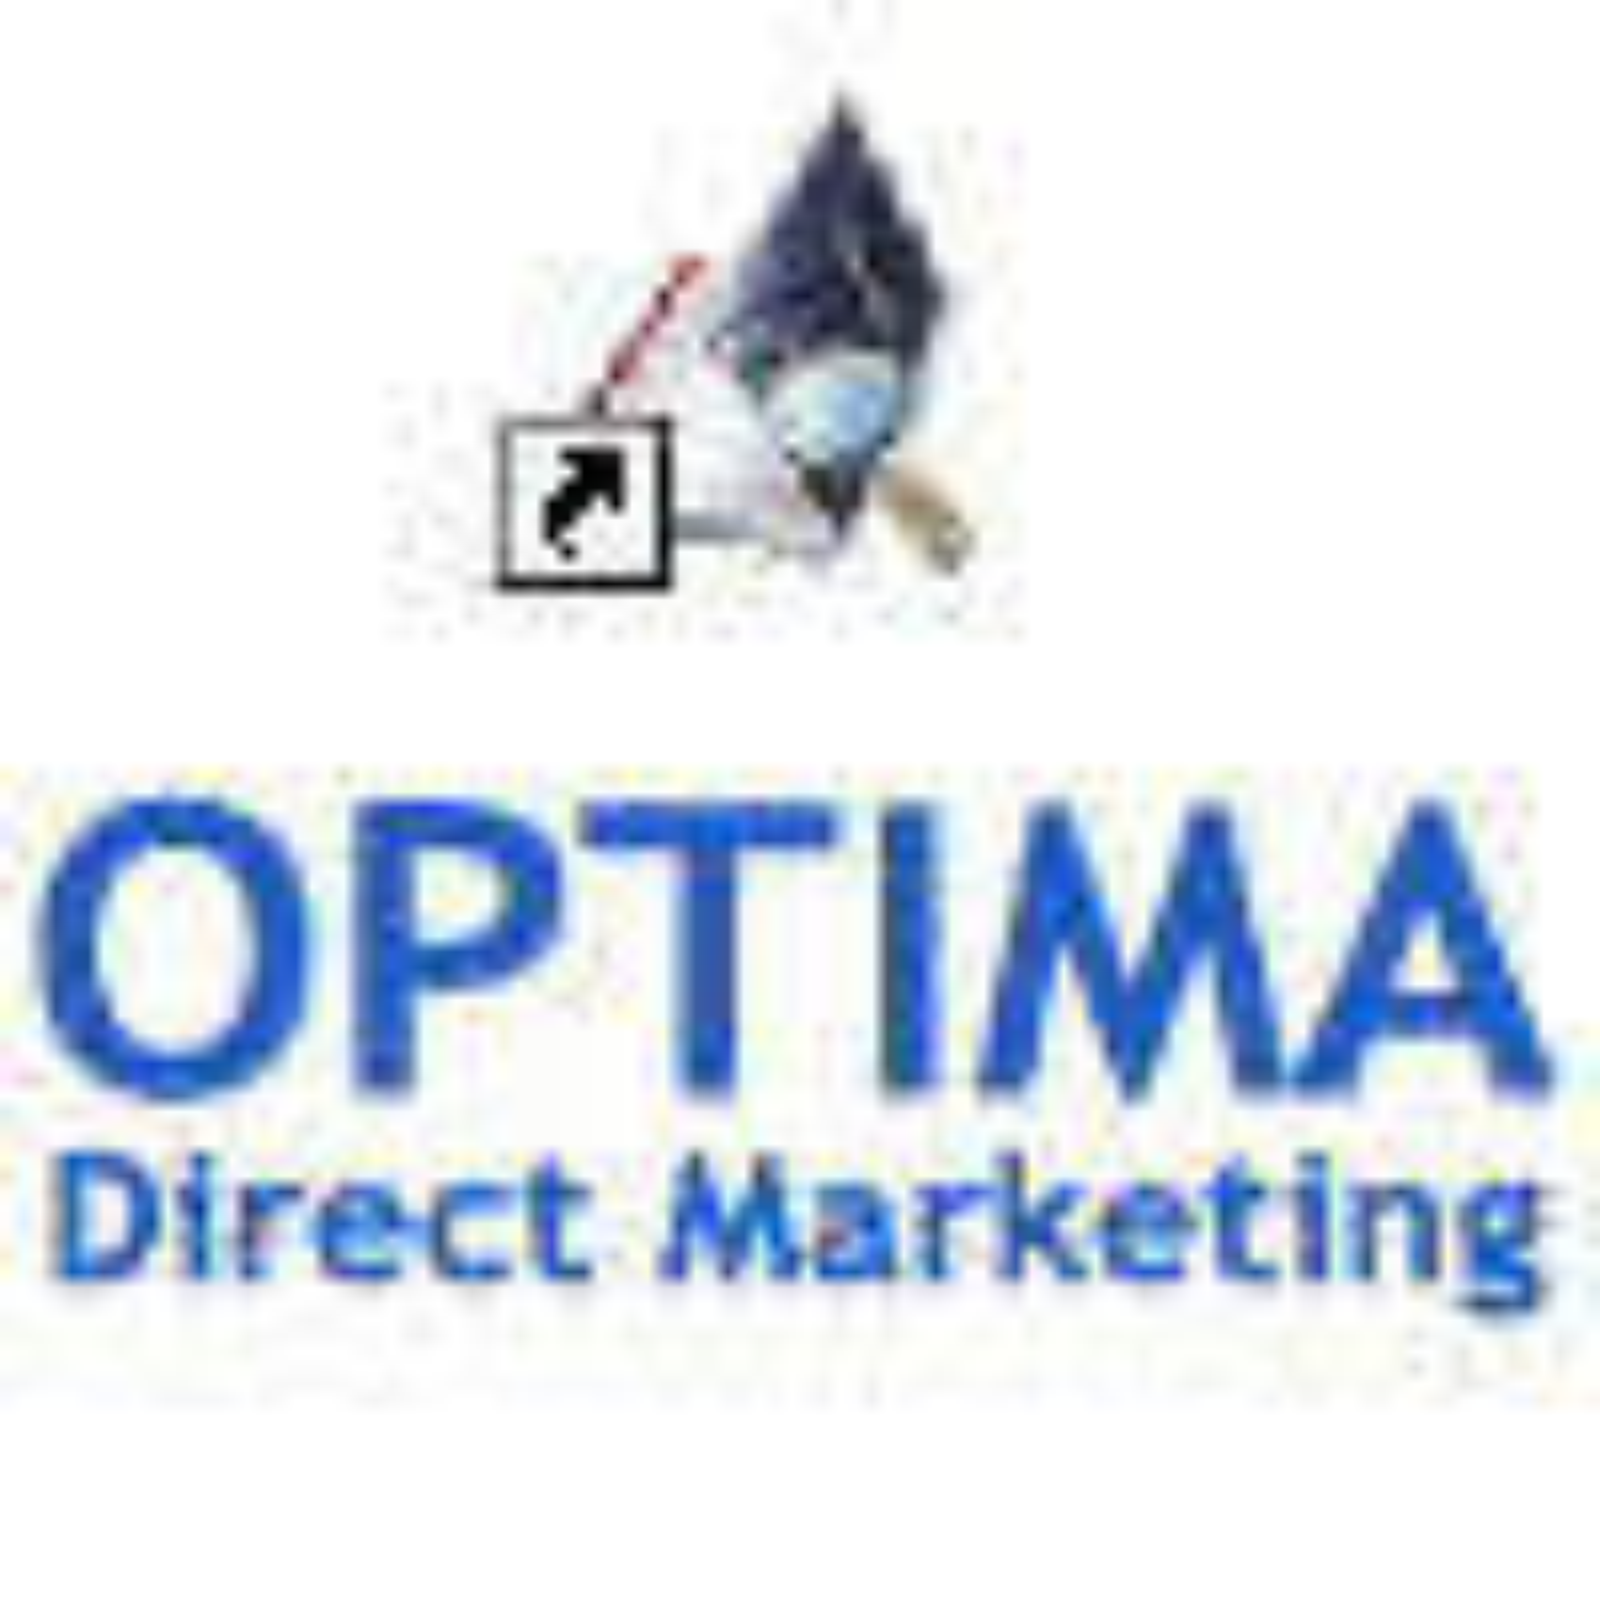 OPTIMA Direct Marketing